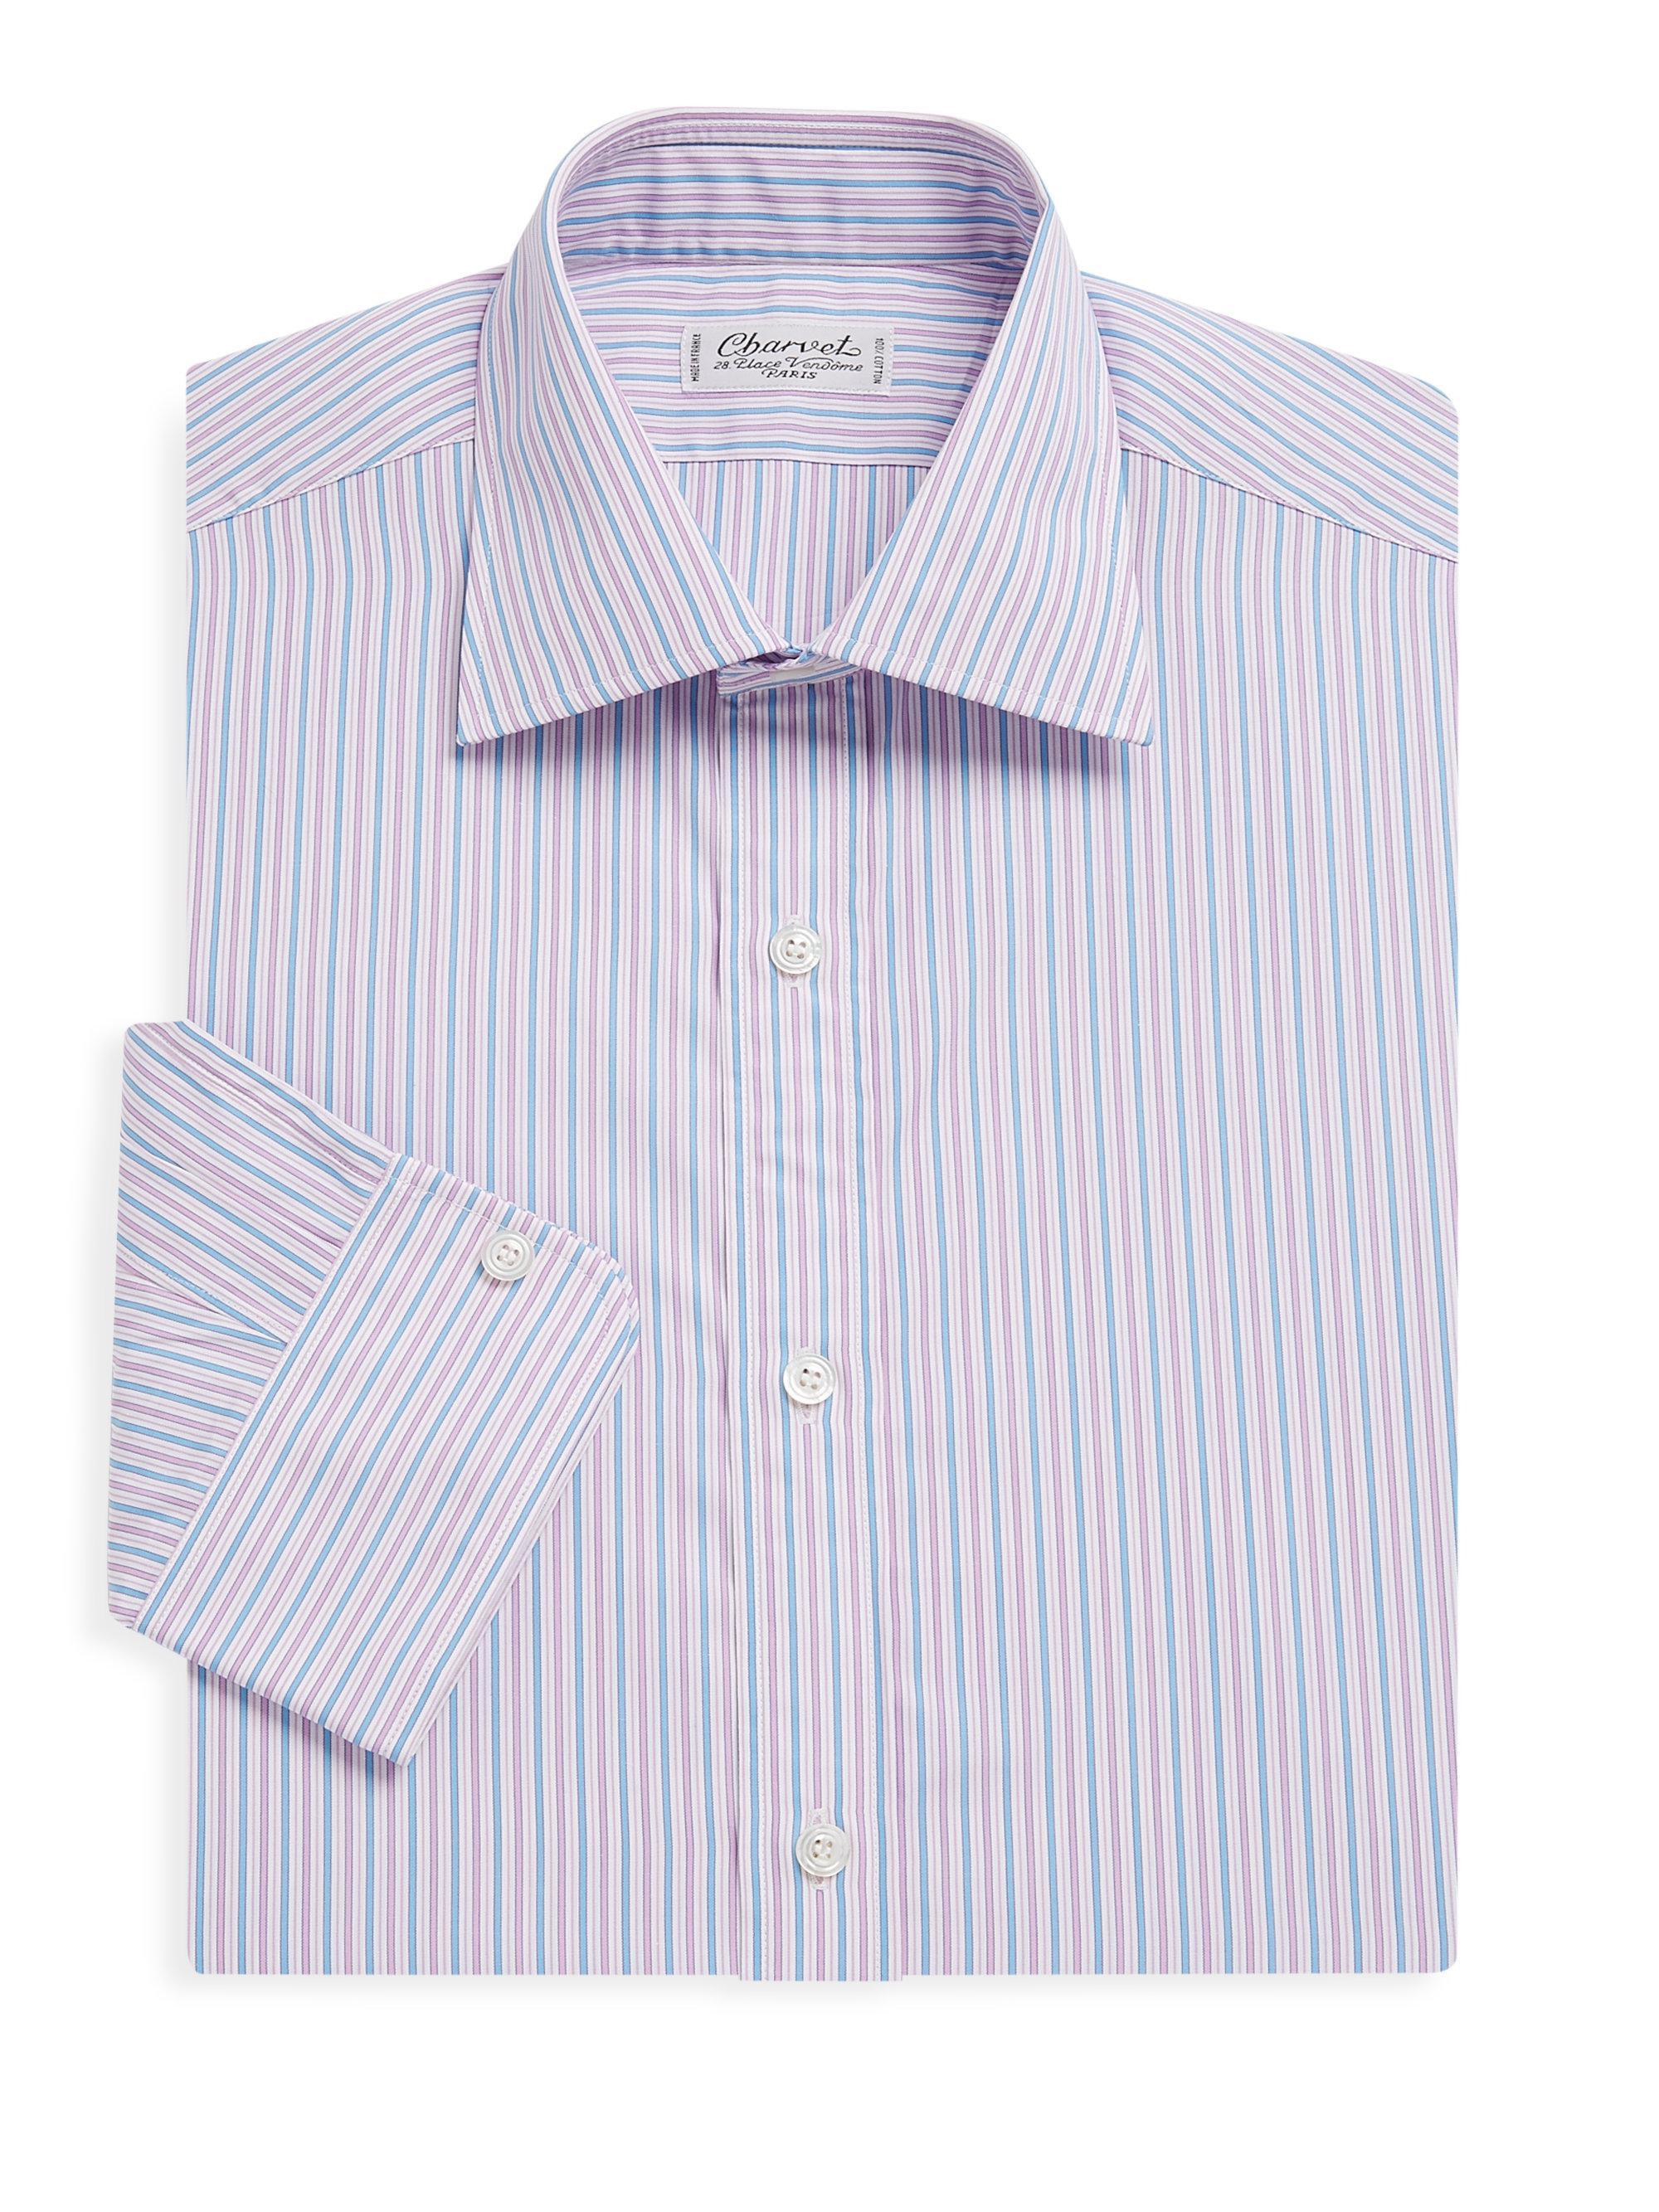 Lyst charvet regular fit dress shirts in pink for men for Regular fit dress shirt